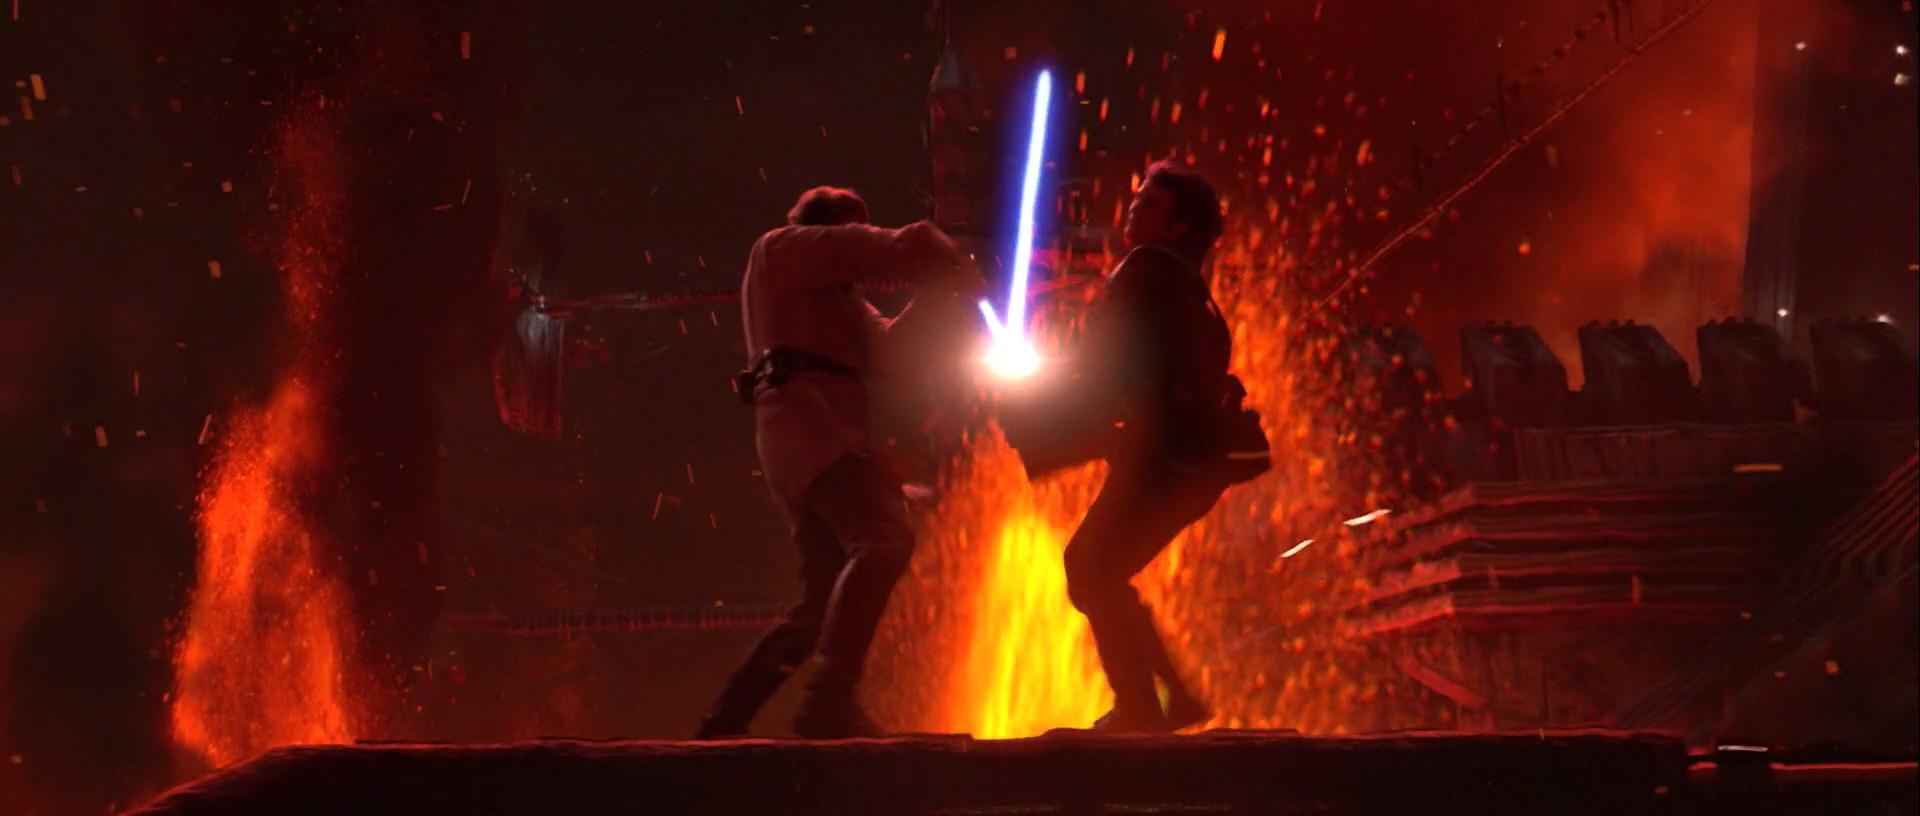 star wars revenge of the sith review retrospective obi wan kenobi anakin skywalker darth vader mustafar duel fight lava planet